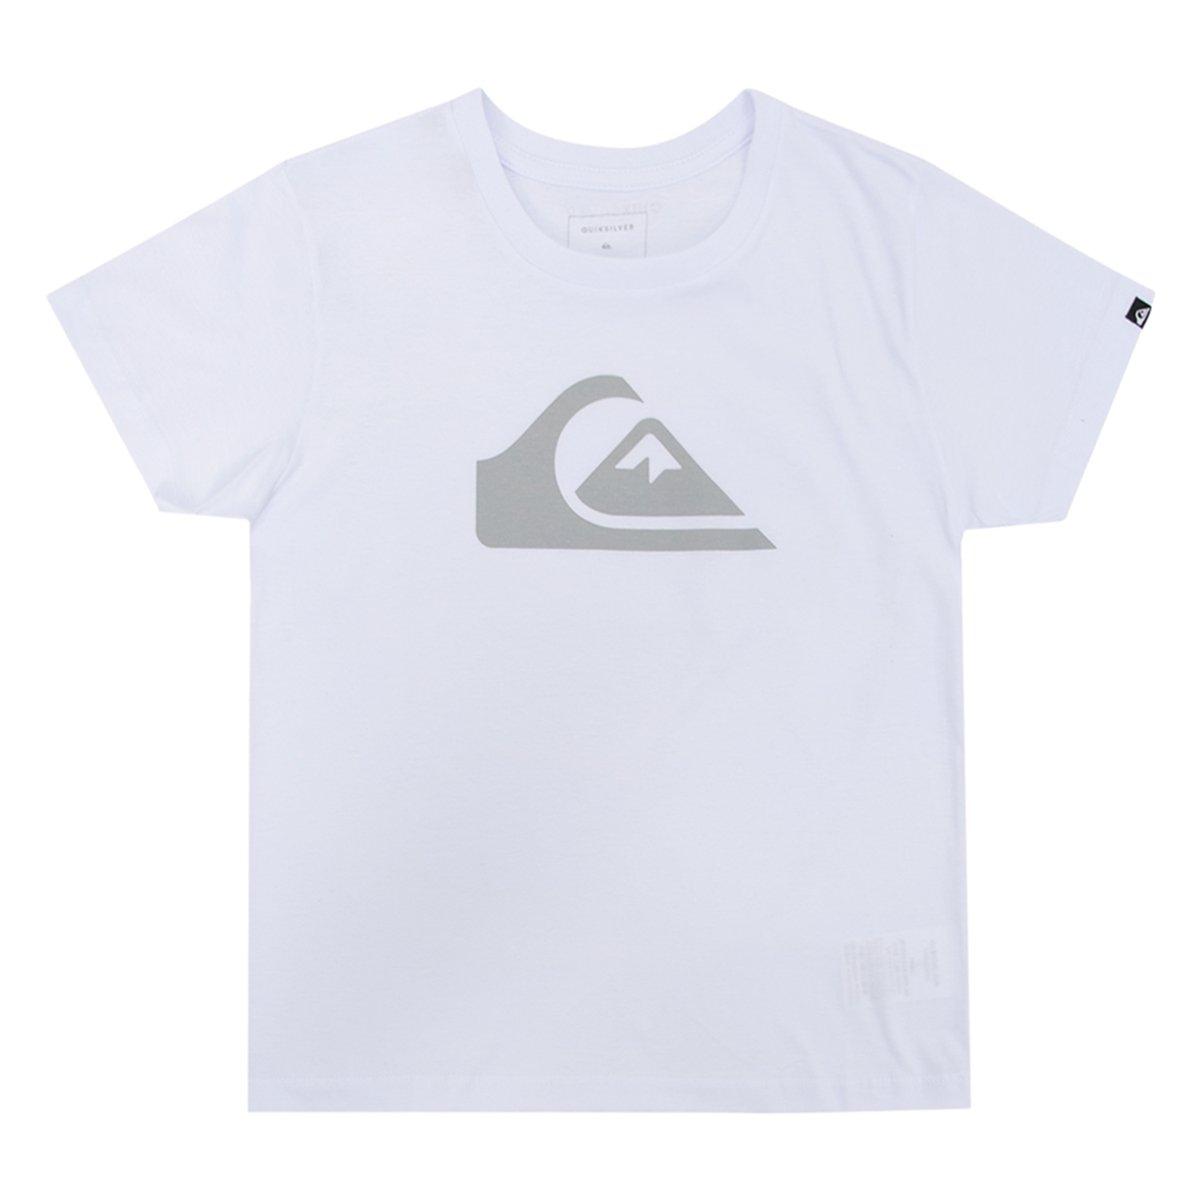 Camiseta Quiksilver Infantil Kids Logo - Compre Agora  c90cd55ef19